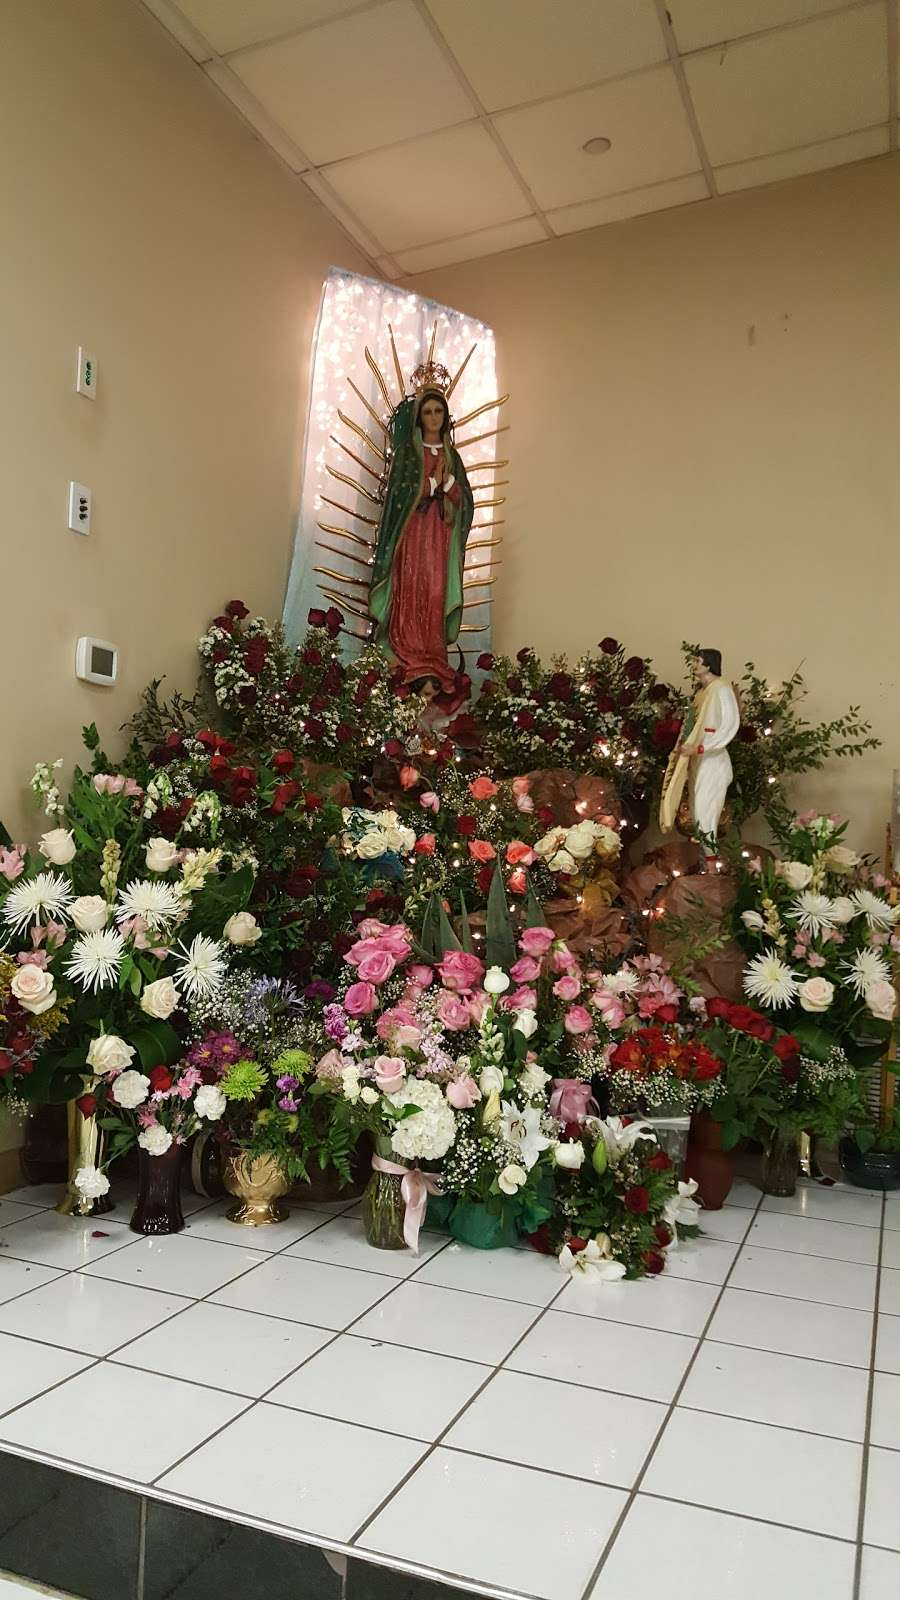 St Philip of Jesus Catholic Church/ San Felipe de Jesus Houston, - church  | Photo 1 of 10 | Address: 9700 Villita St, Houston, TX 77013, USA | Phone: (713) 672-6141